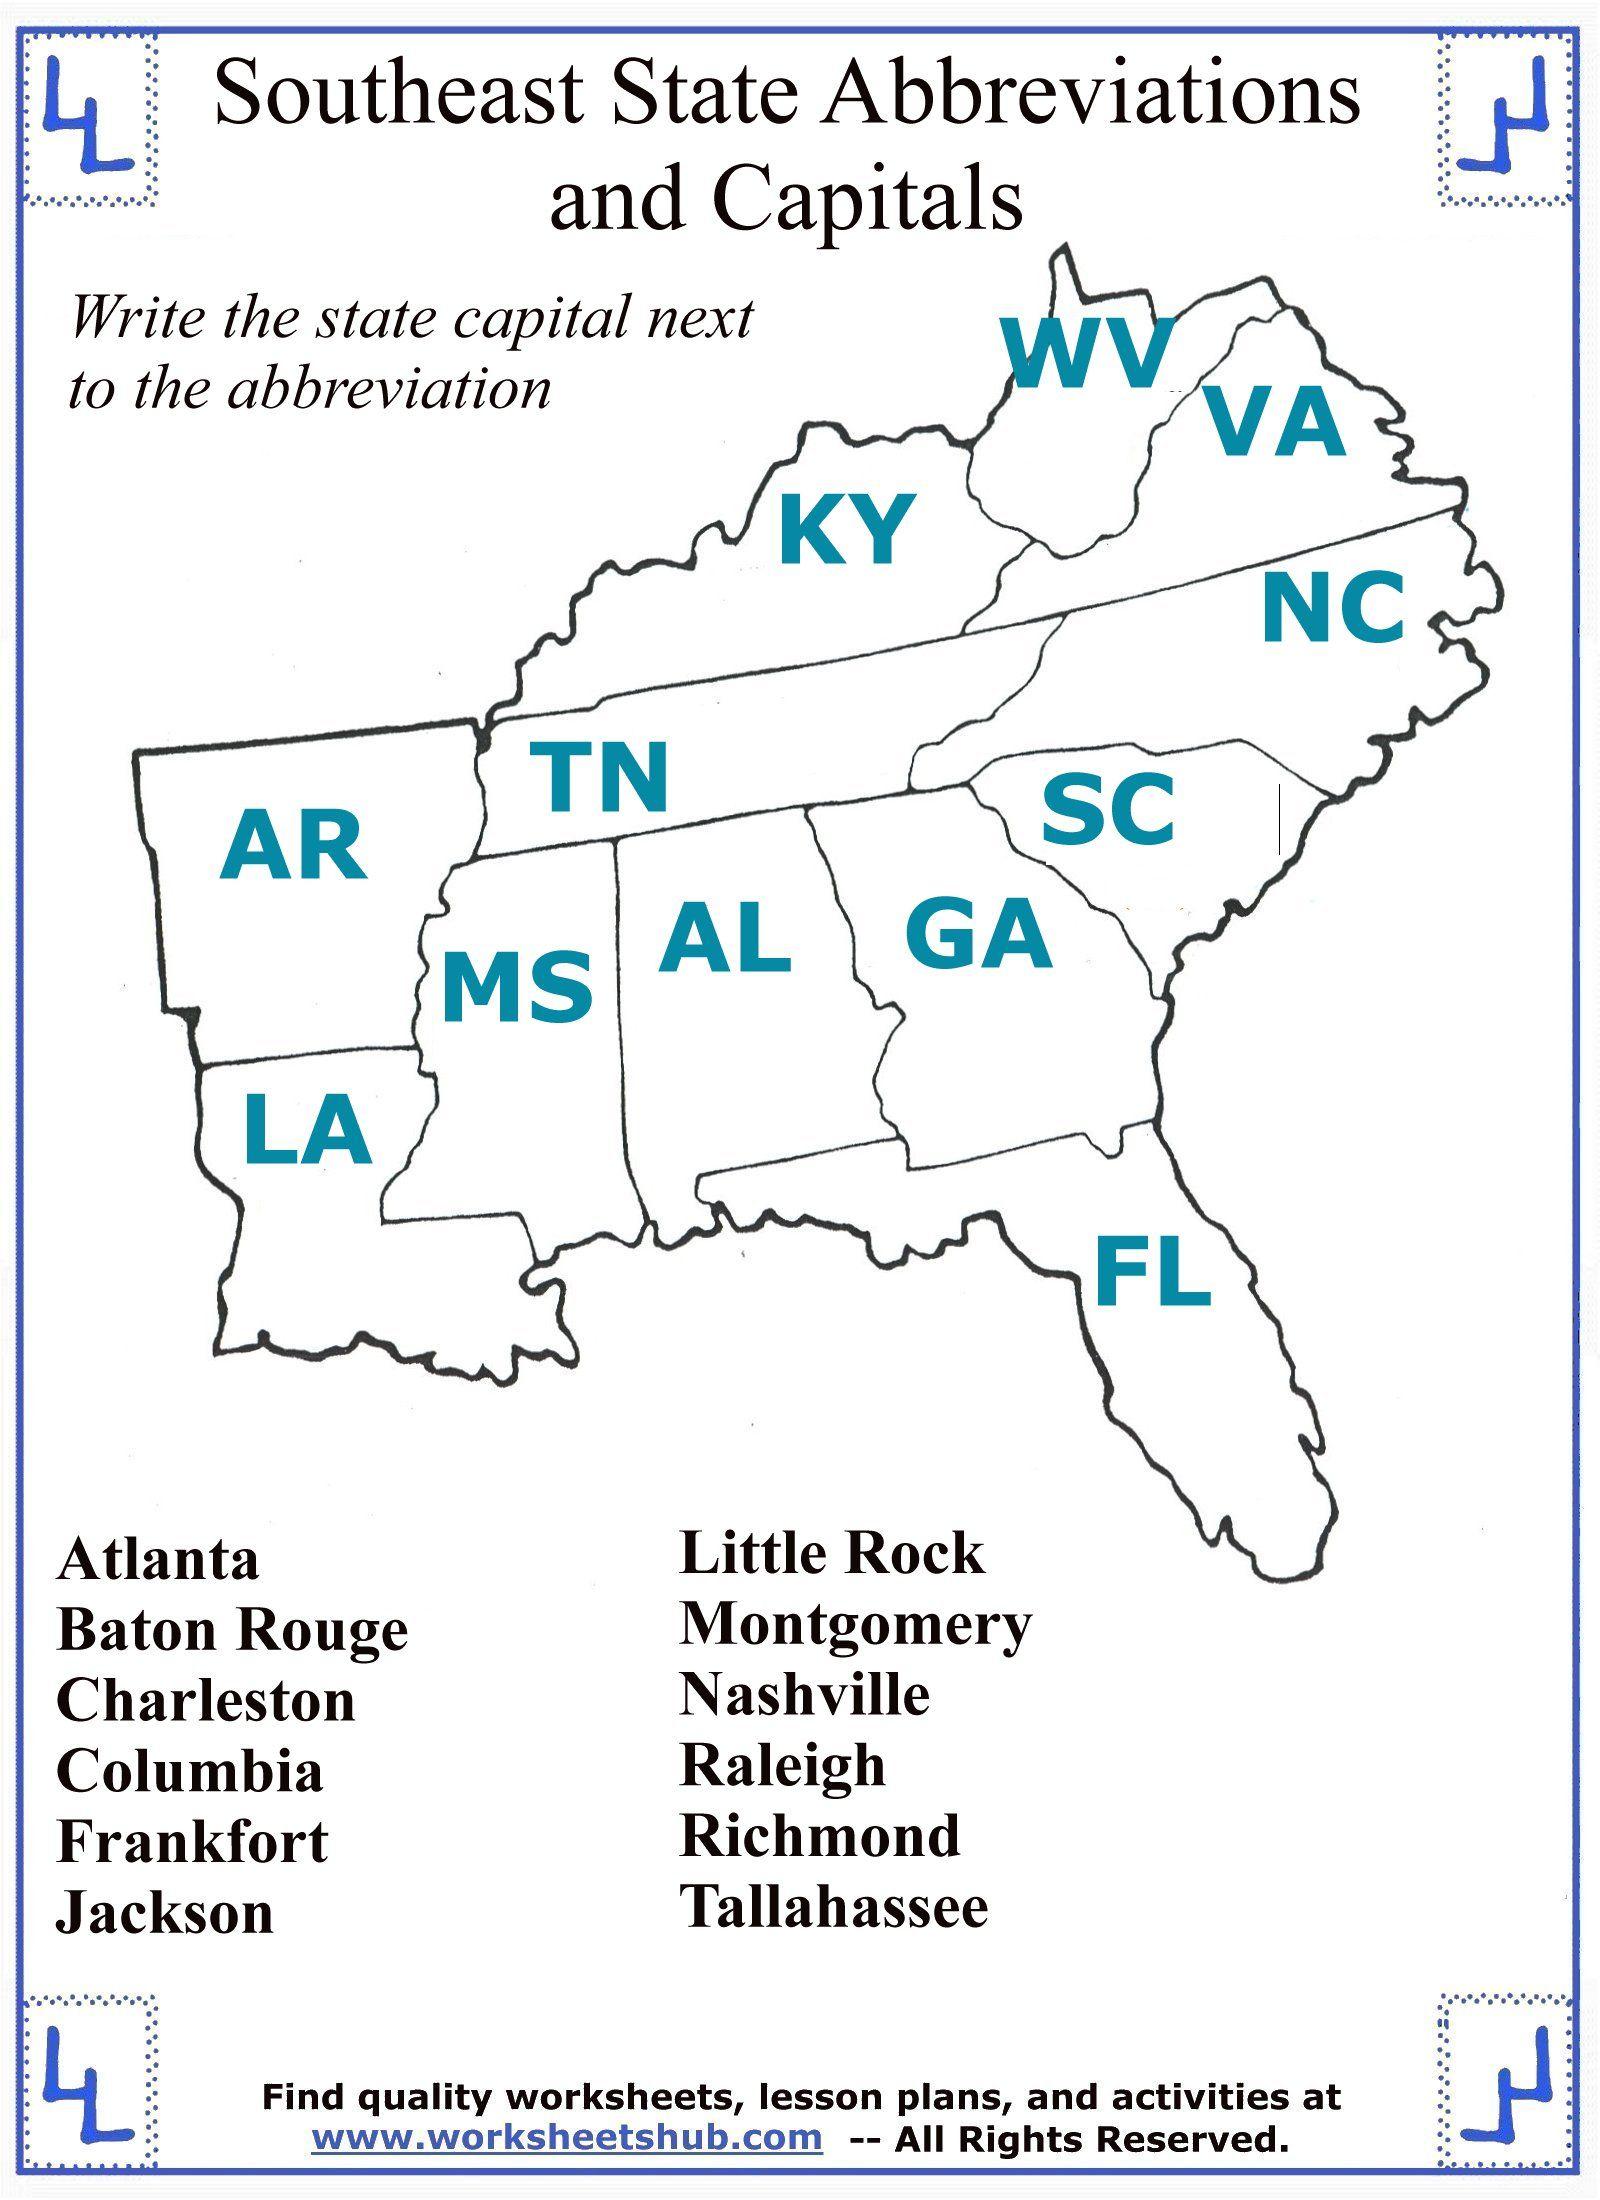 4th Grade Social Studies Southeast State Abbreviations and Capitals   Social  studies worksheets [ 2200 x 1600 Pixel ]